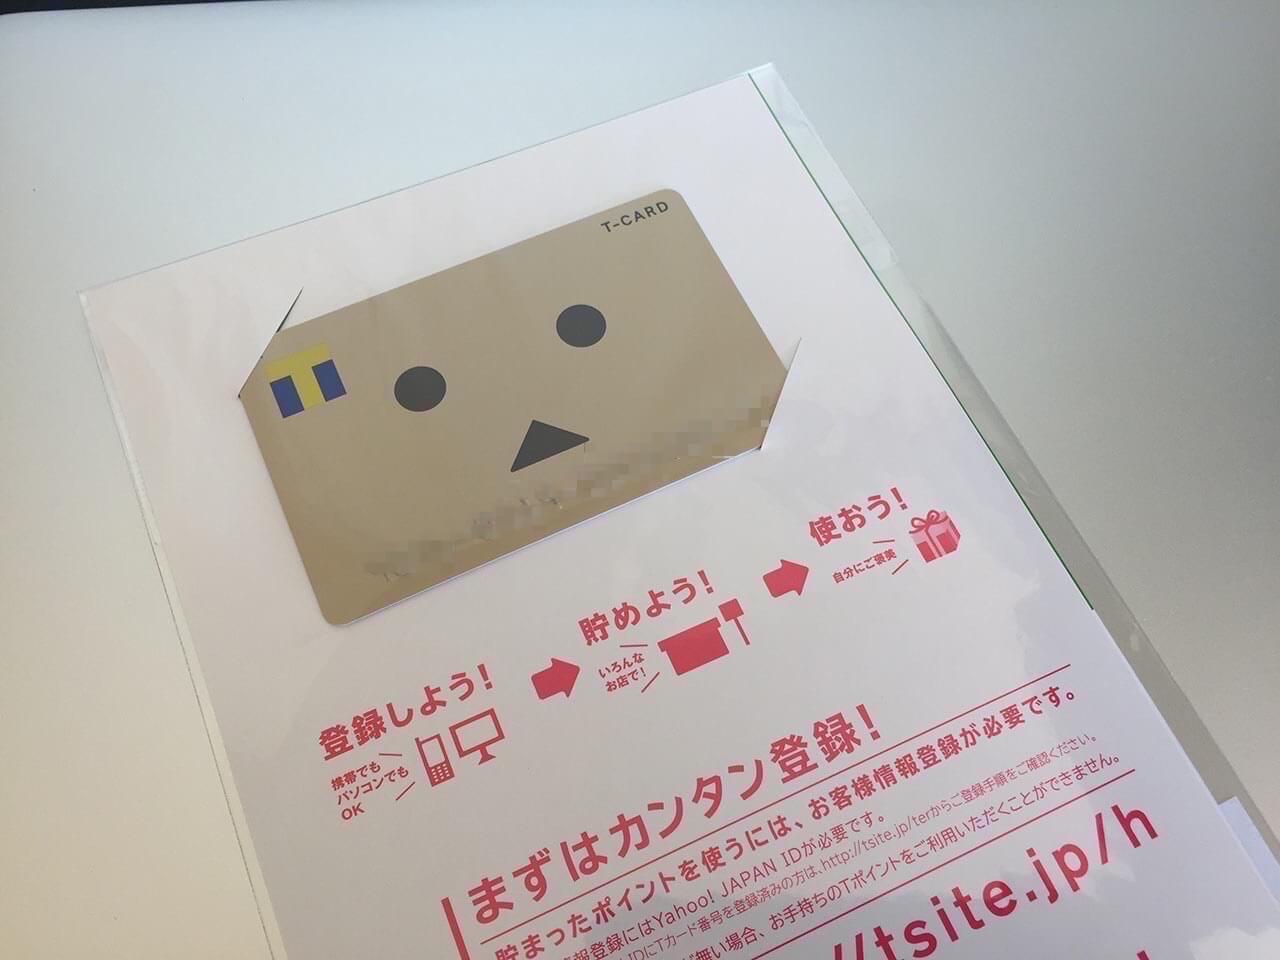 DANBOARD x Tカード